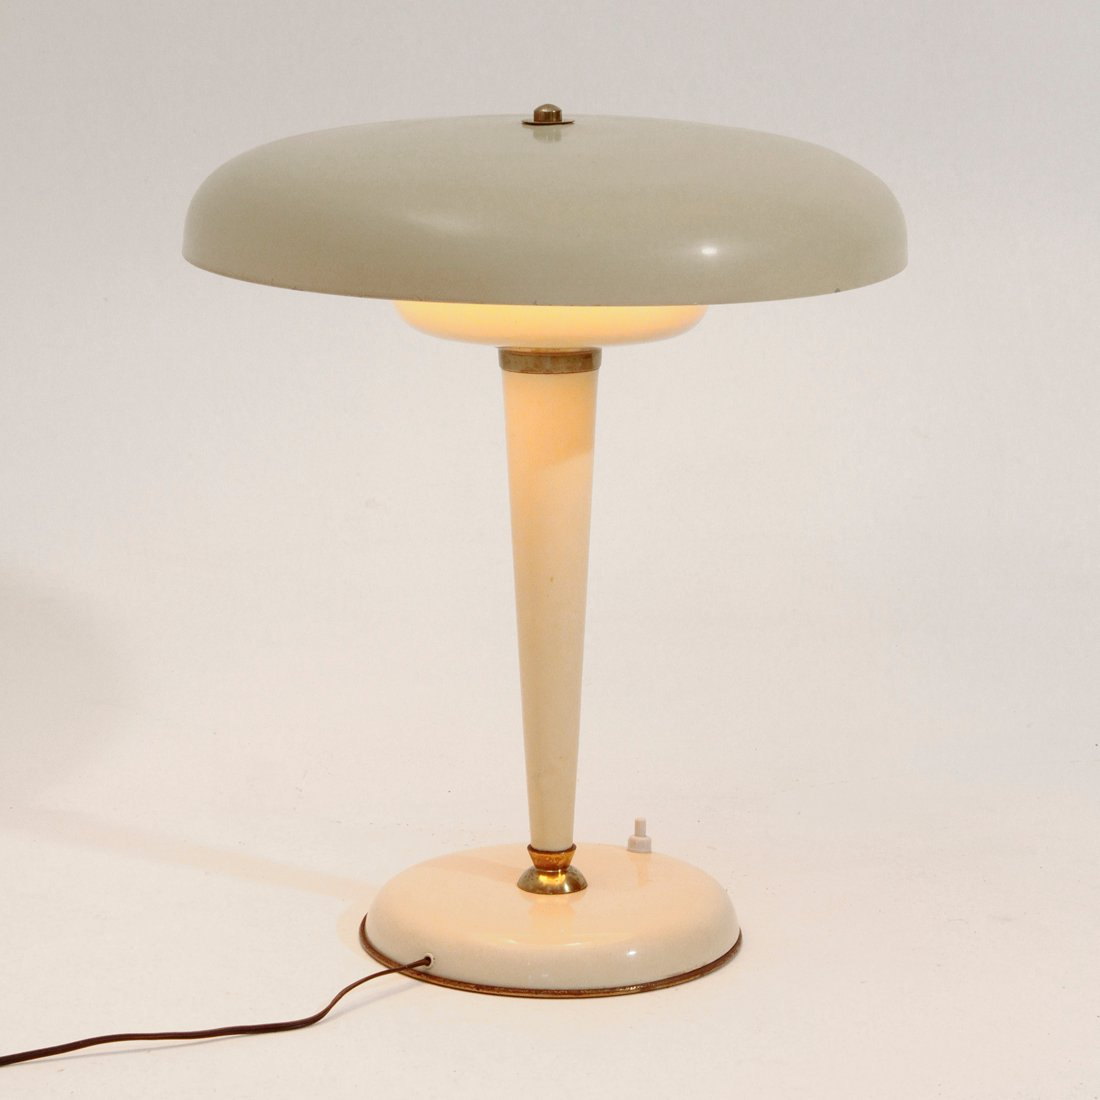 art deco tischlampe 1940er bei pamono kaufen. Black Bedroom Furniture Sets. Home Design Ideas